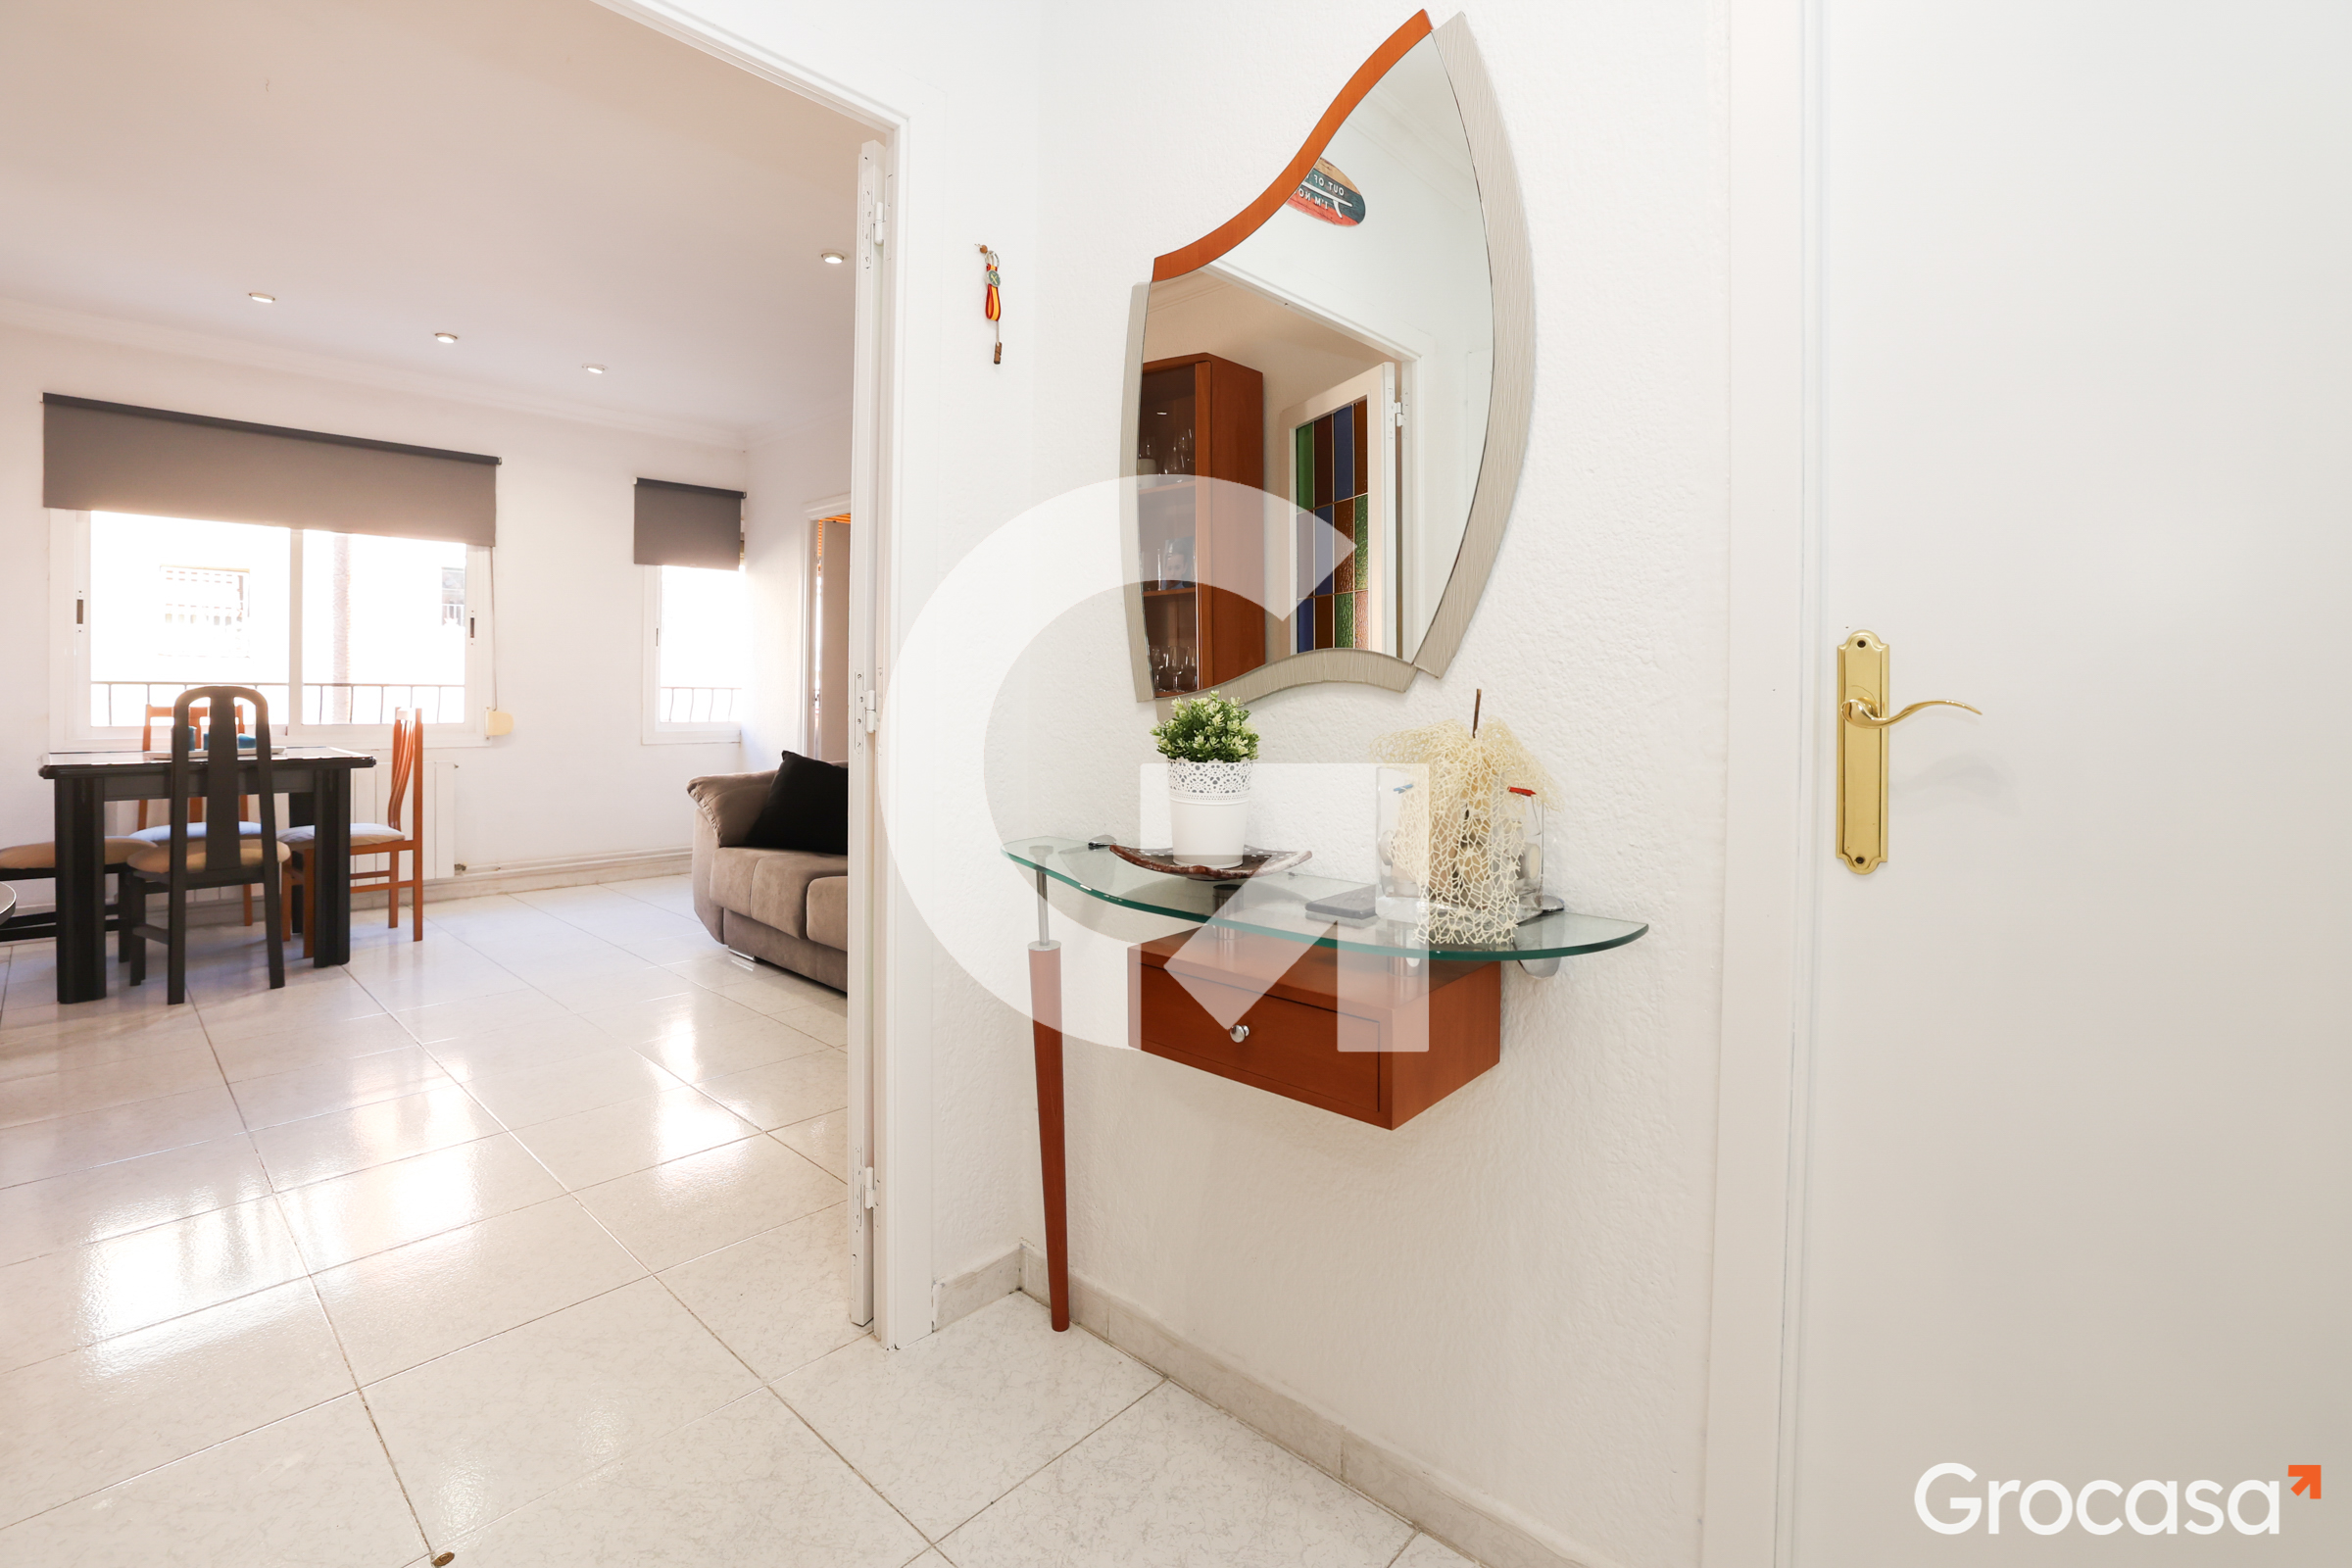 Piso en Can vidalet en Esplugues de Llobregat en Venta por 155.000€